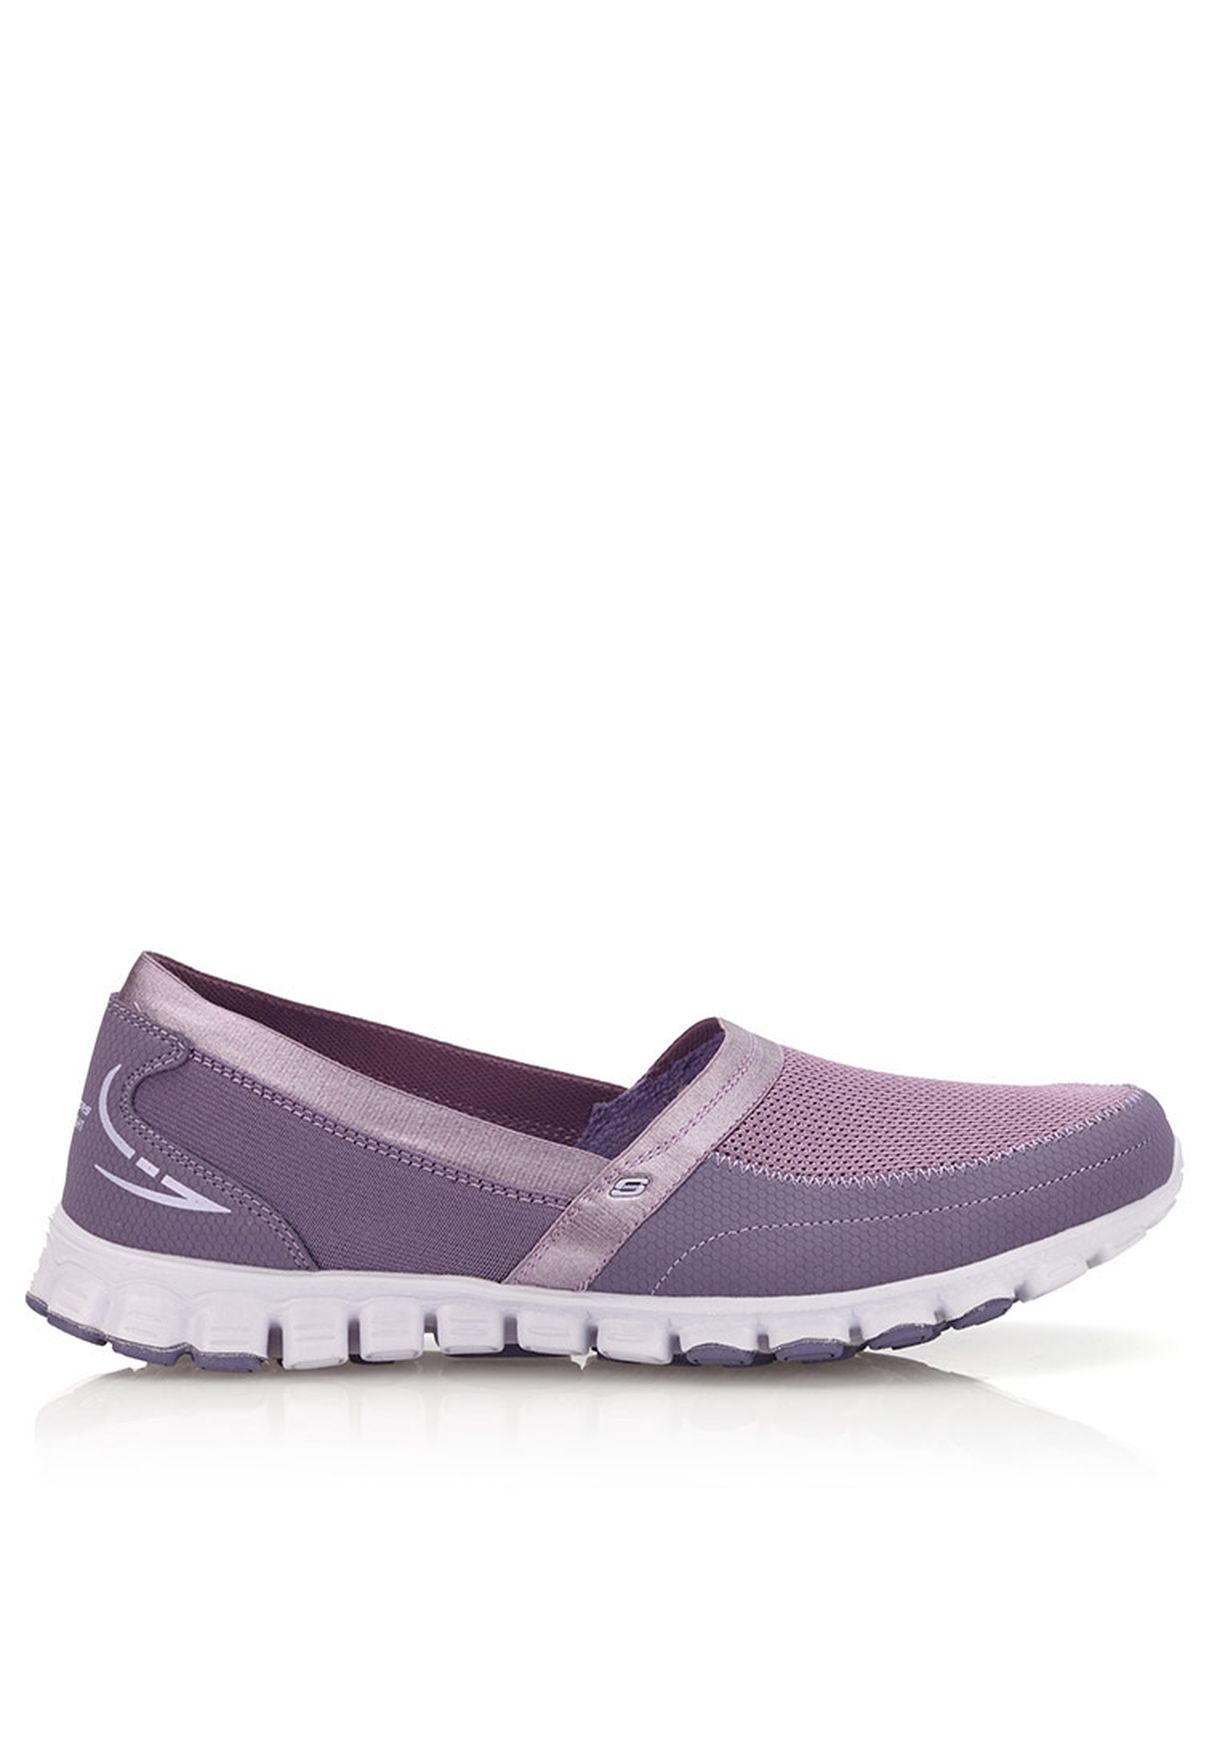 EZ Flex Take It Easy Comfort shoes